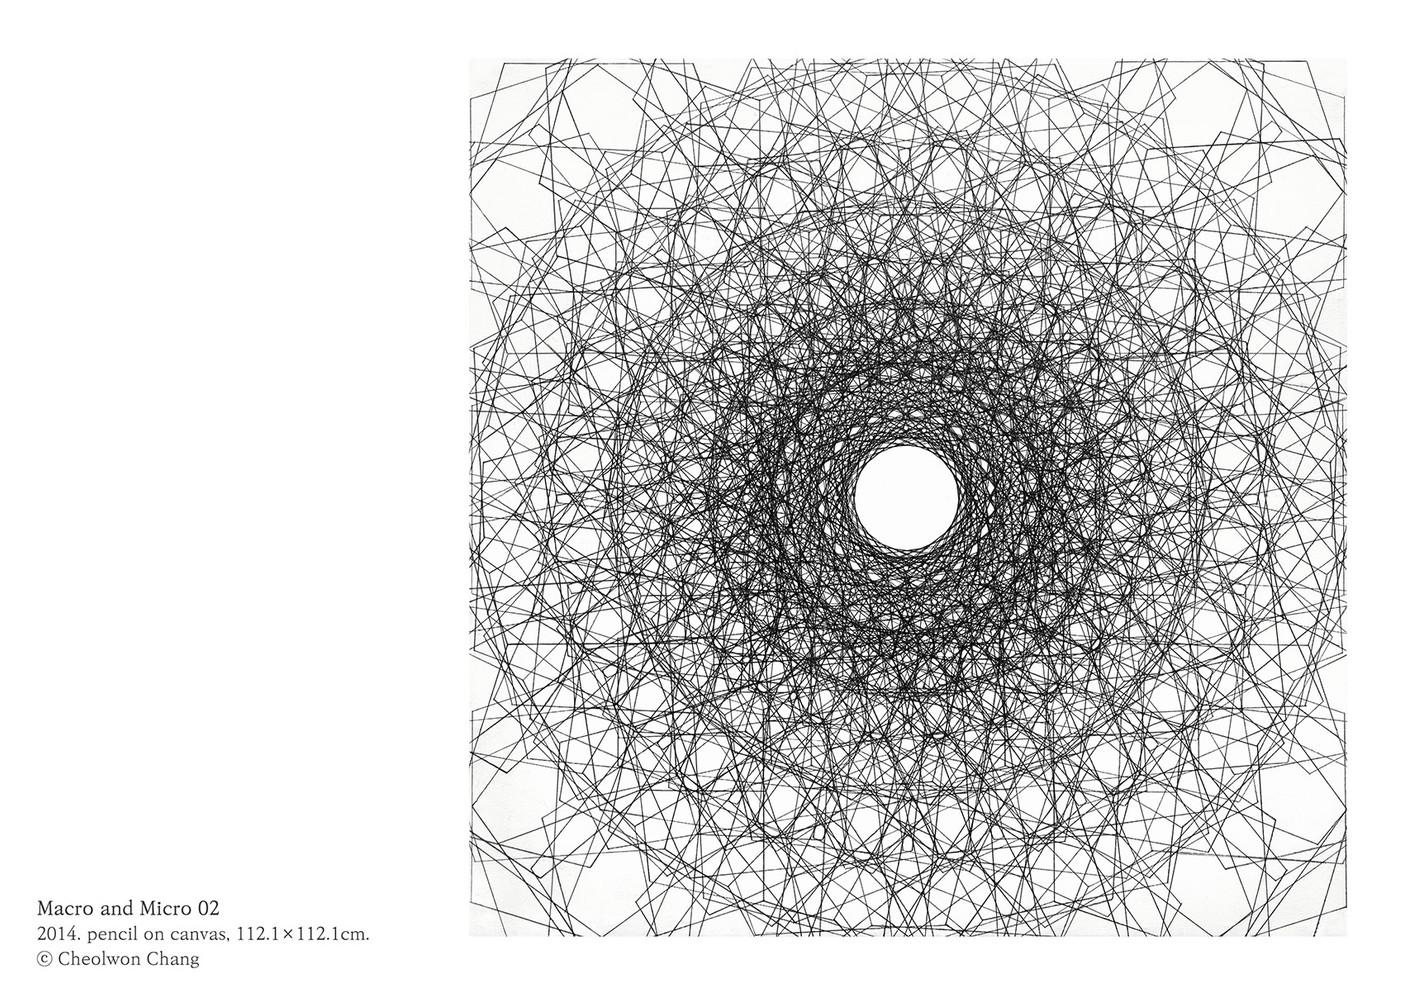 pattern_cheolwon chang (7).jpg